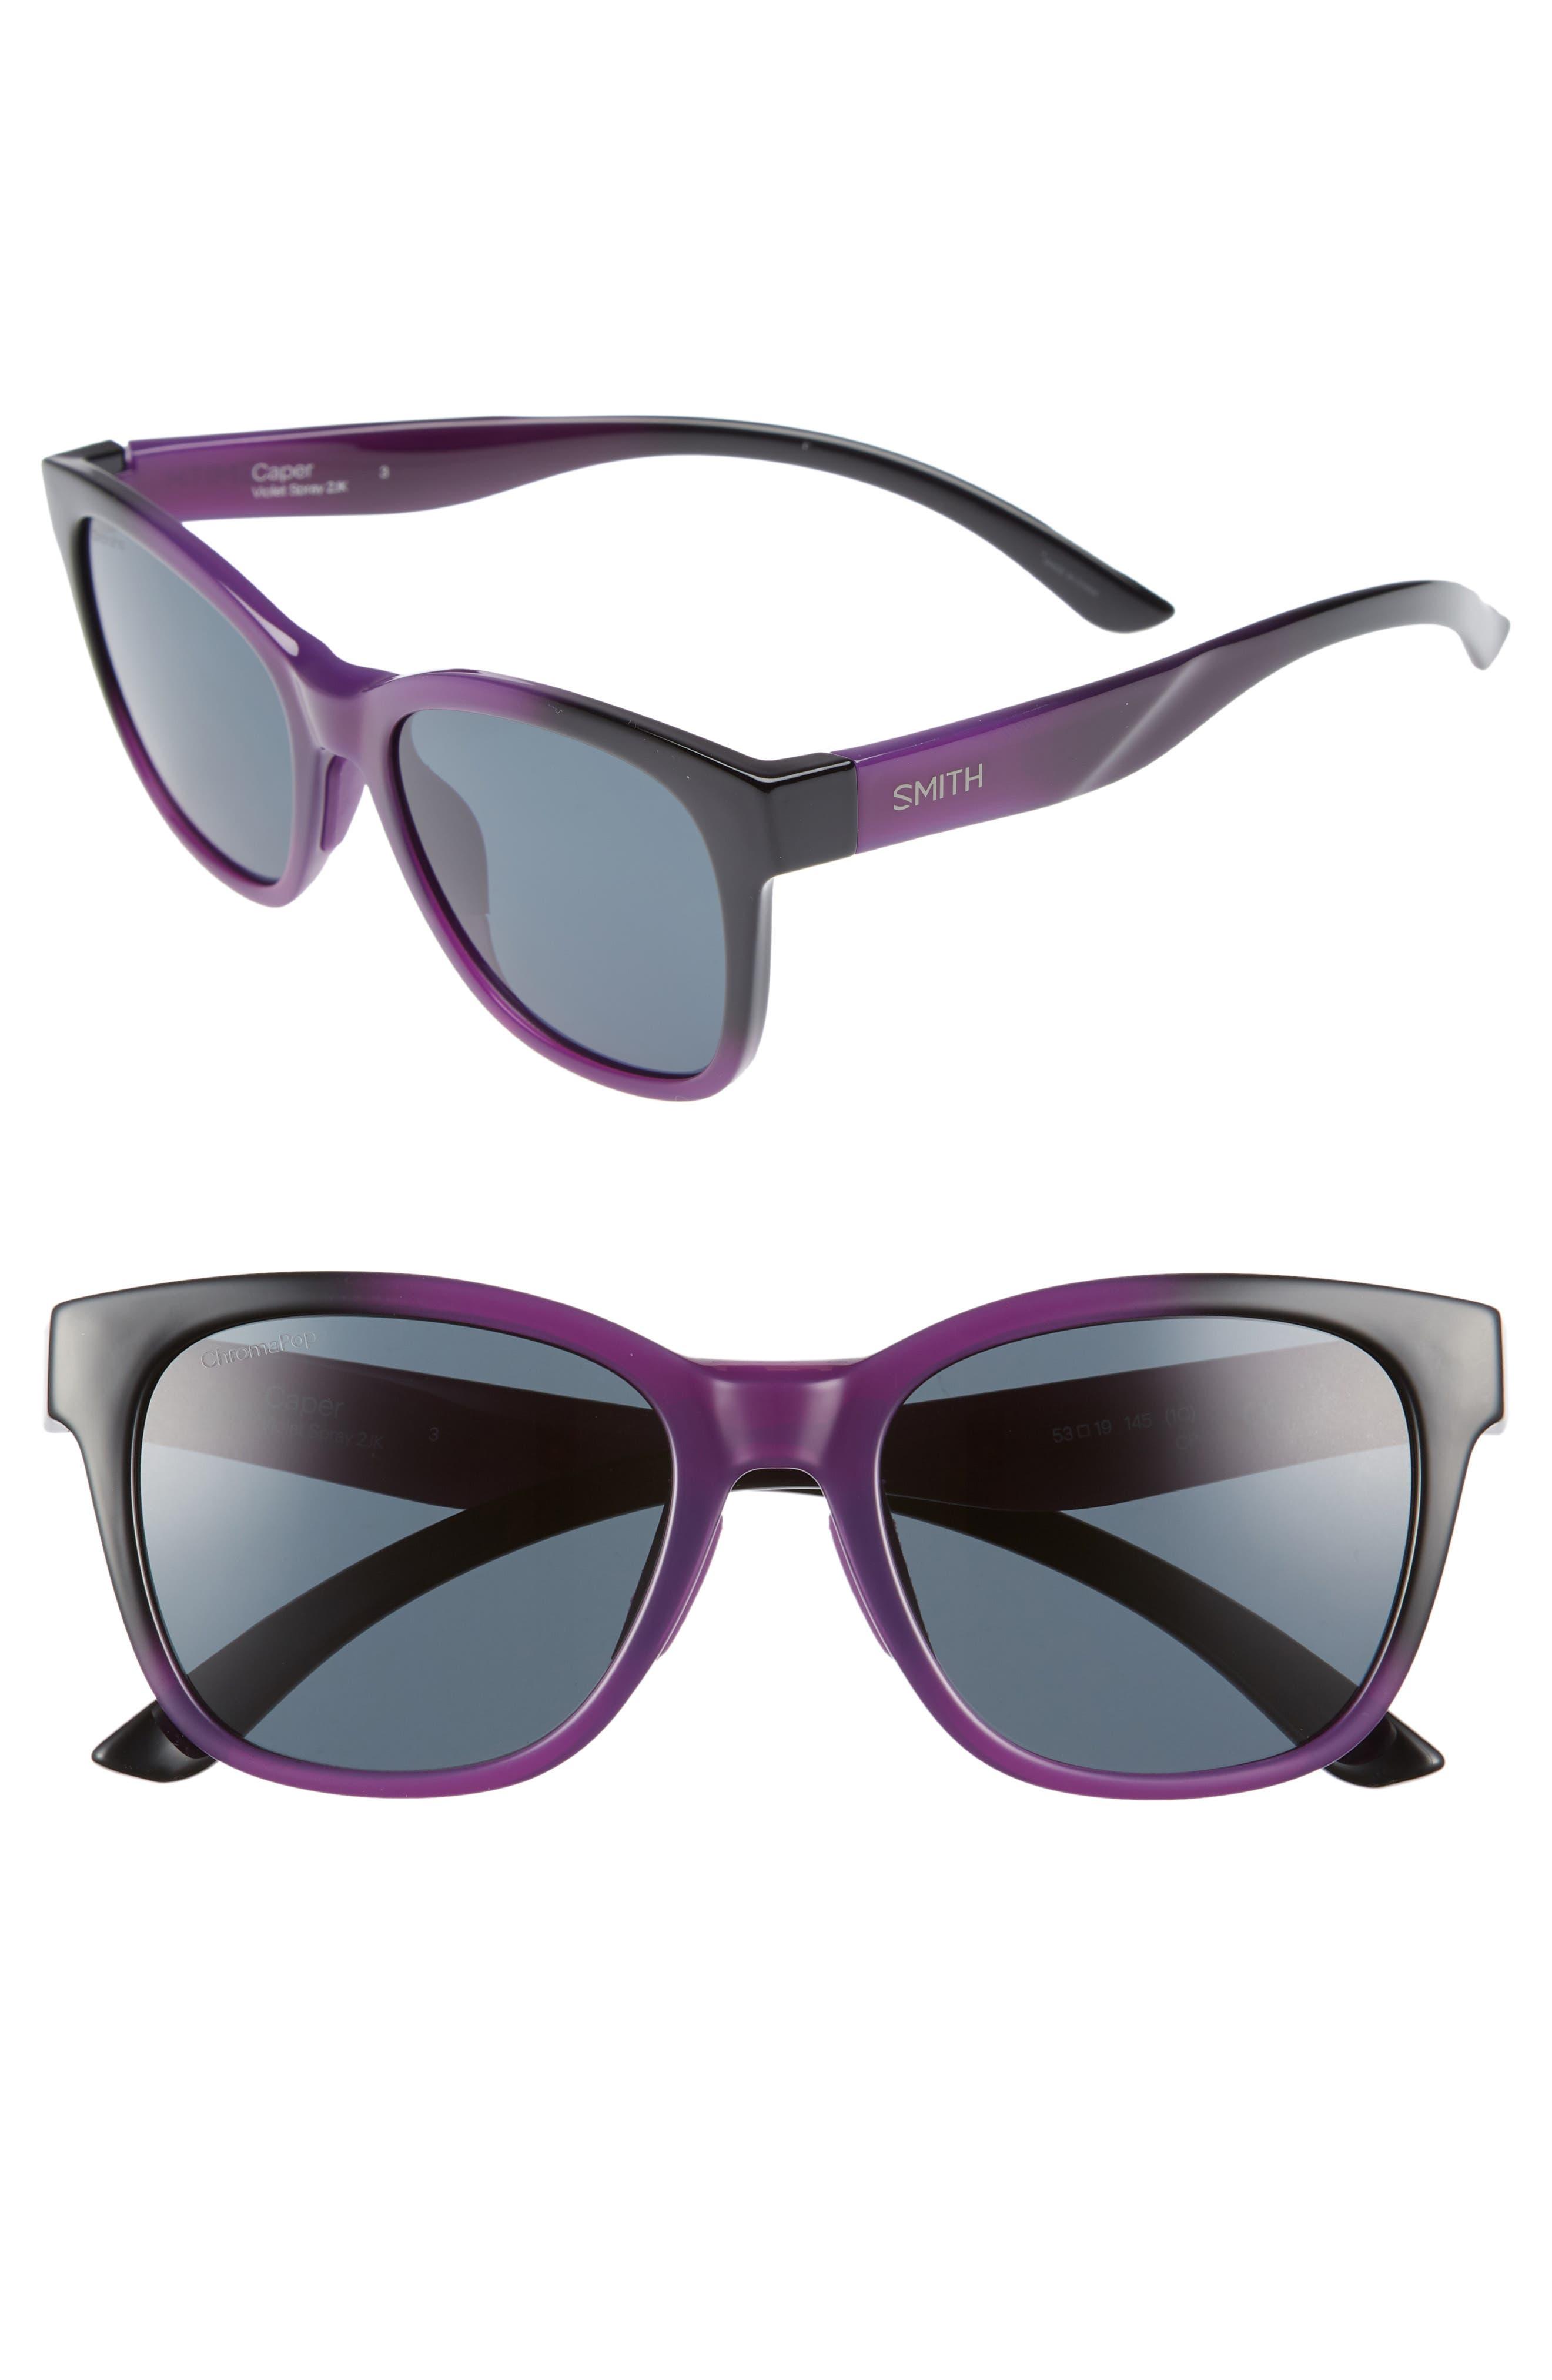 Caper 53mm ChromaPop<sup>™</sup> Square Sunglasses,                         Main,                         color, Violet Spray